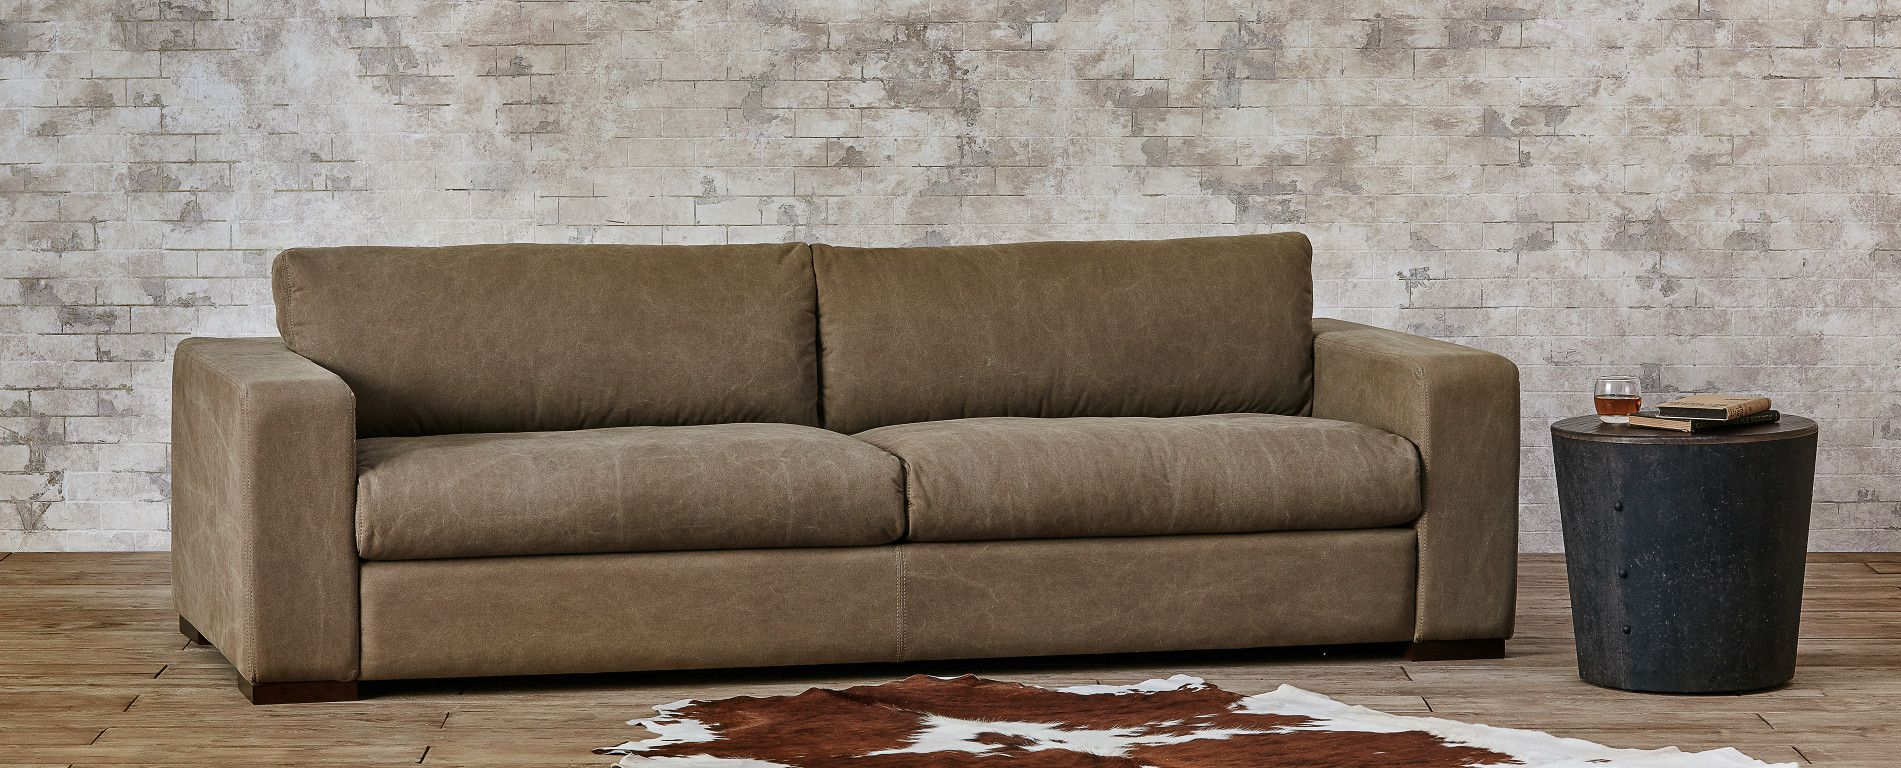 Aberdeen Sofa Leather Cotton Canvas Velvet Or Wool 96